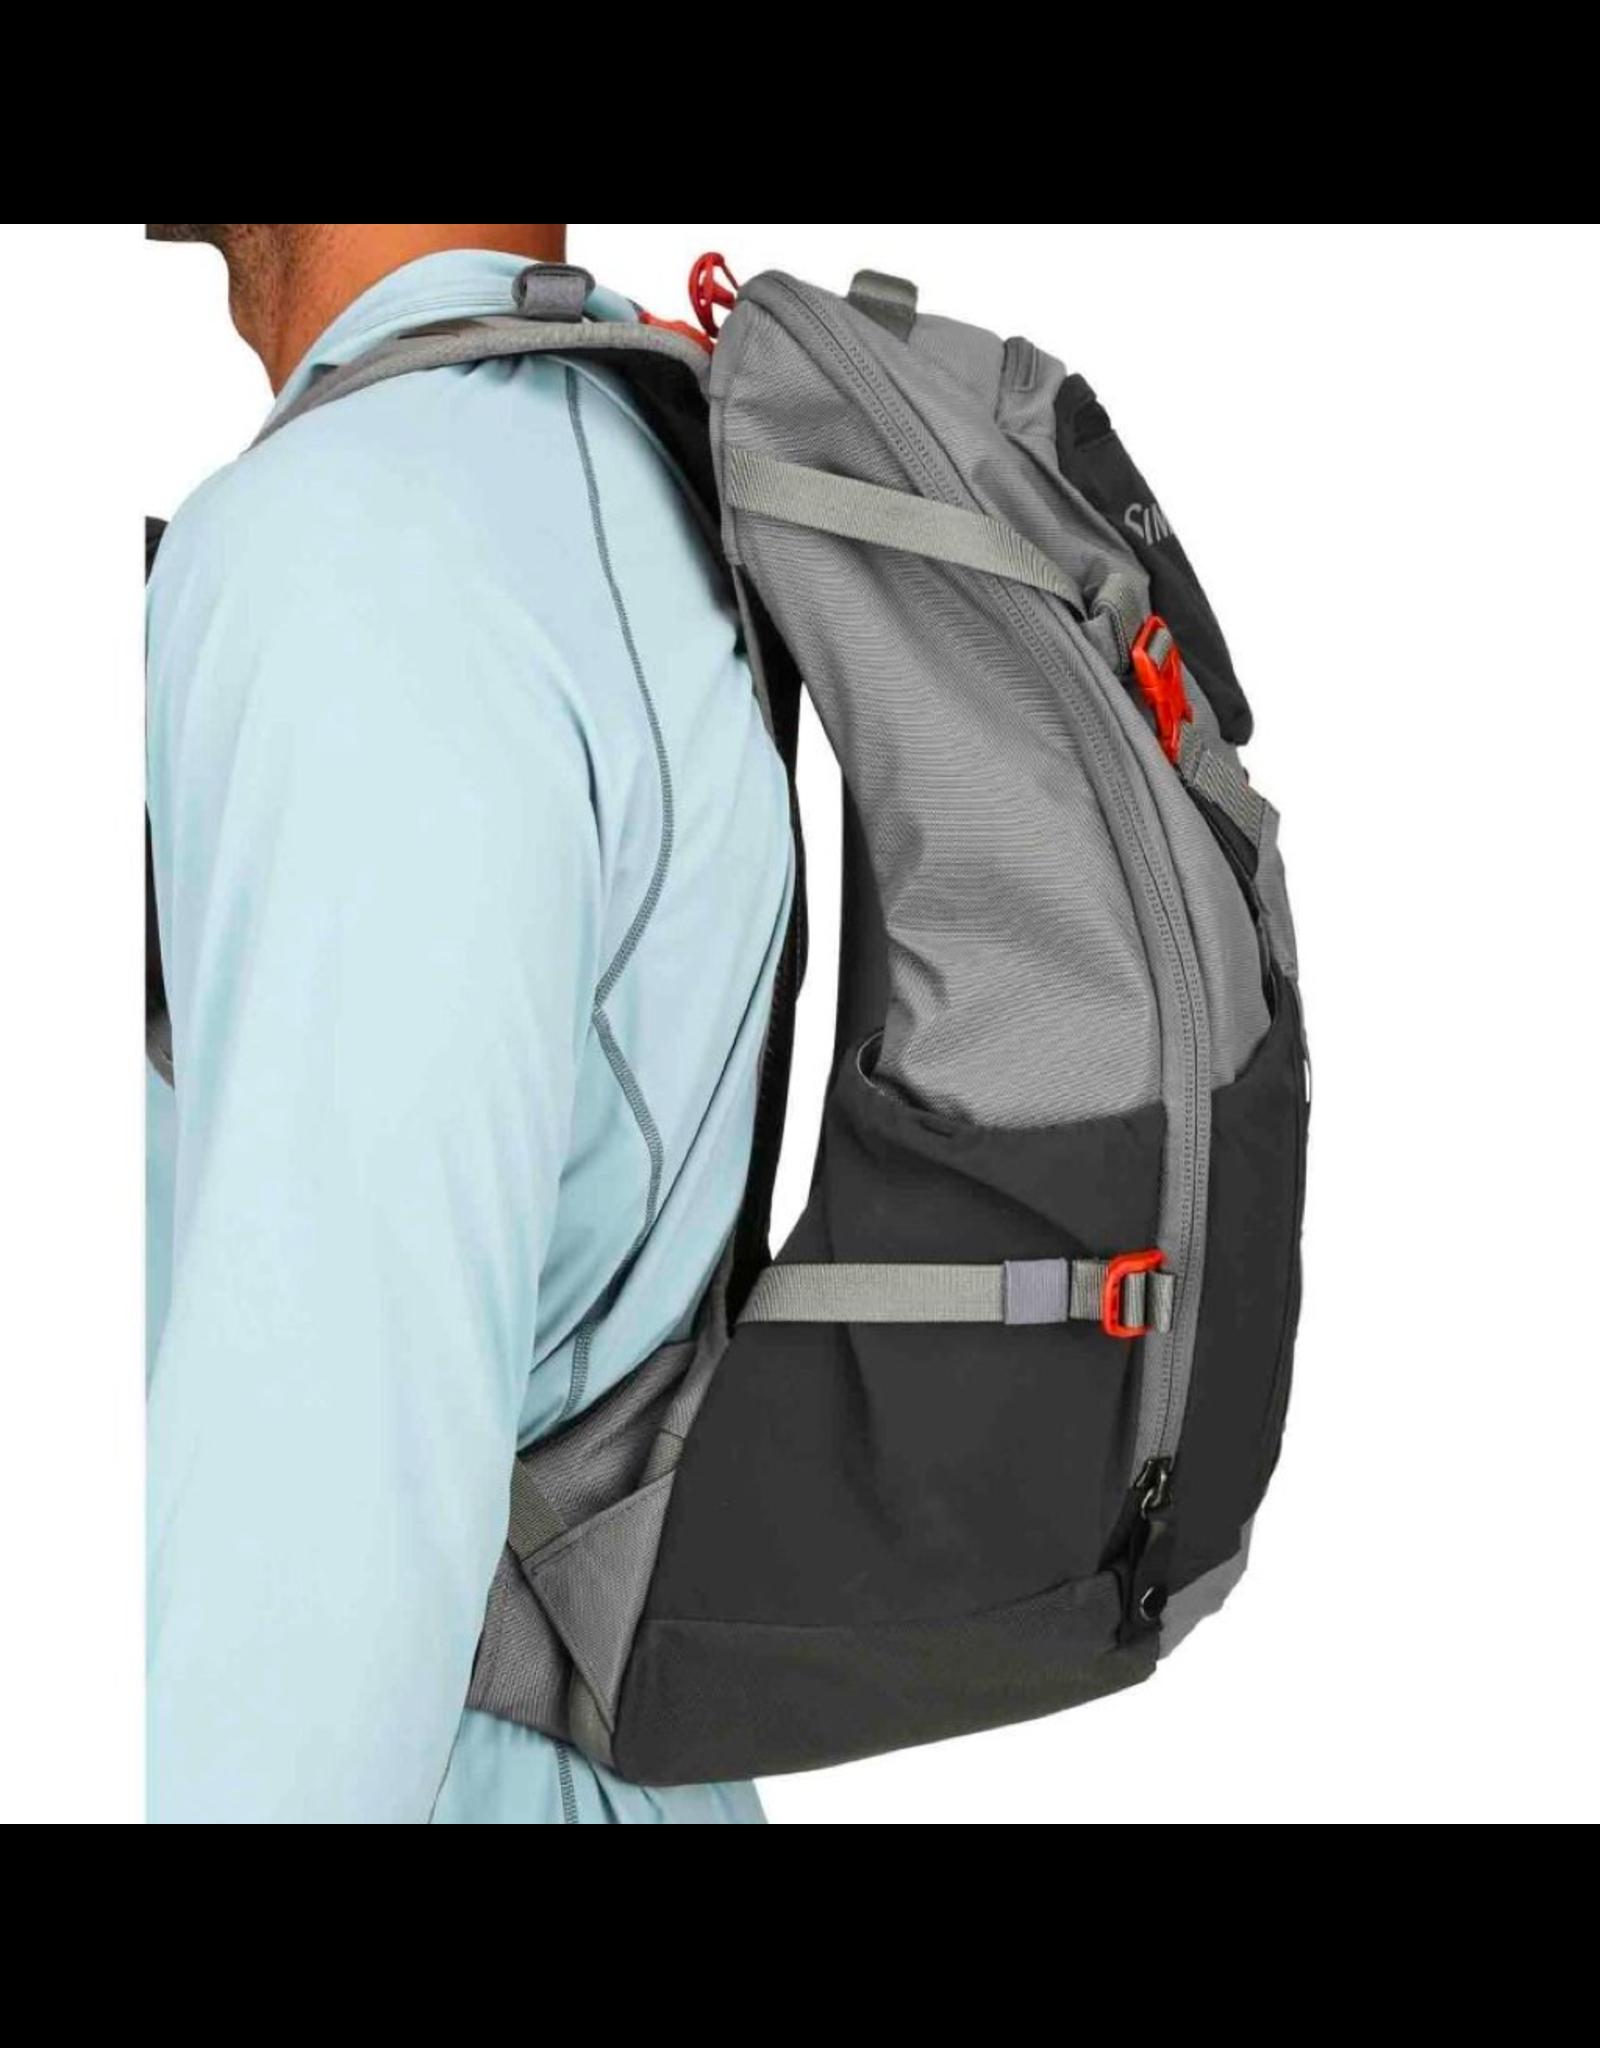 Simms Freestone Fishing Backpack Steel